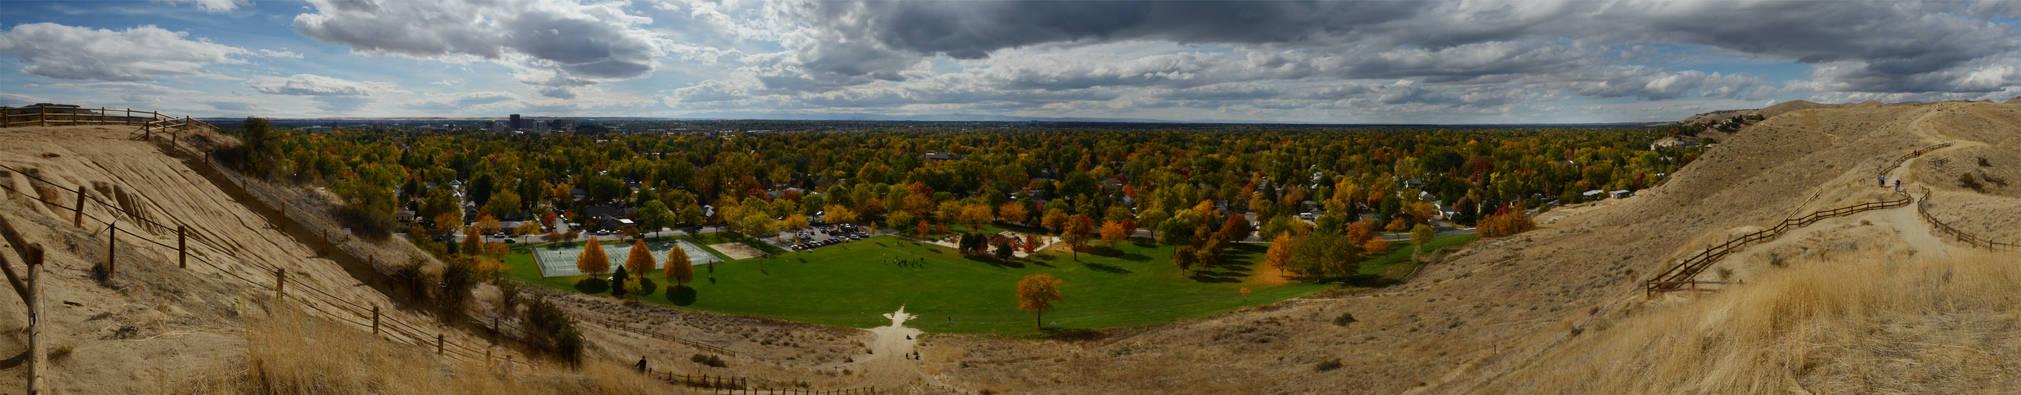 Camelback Park Fall 2012-10-20 3